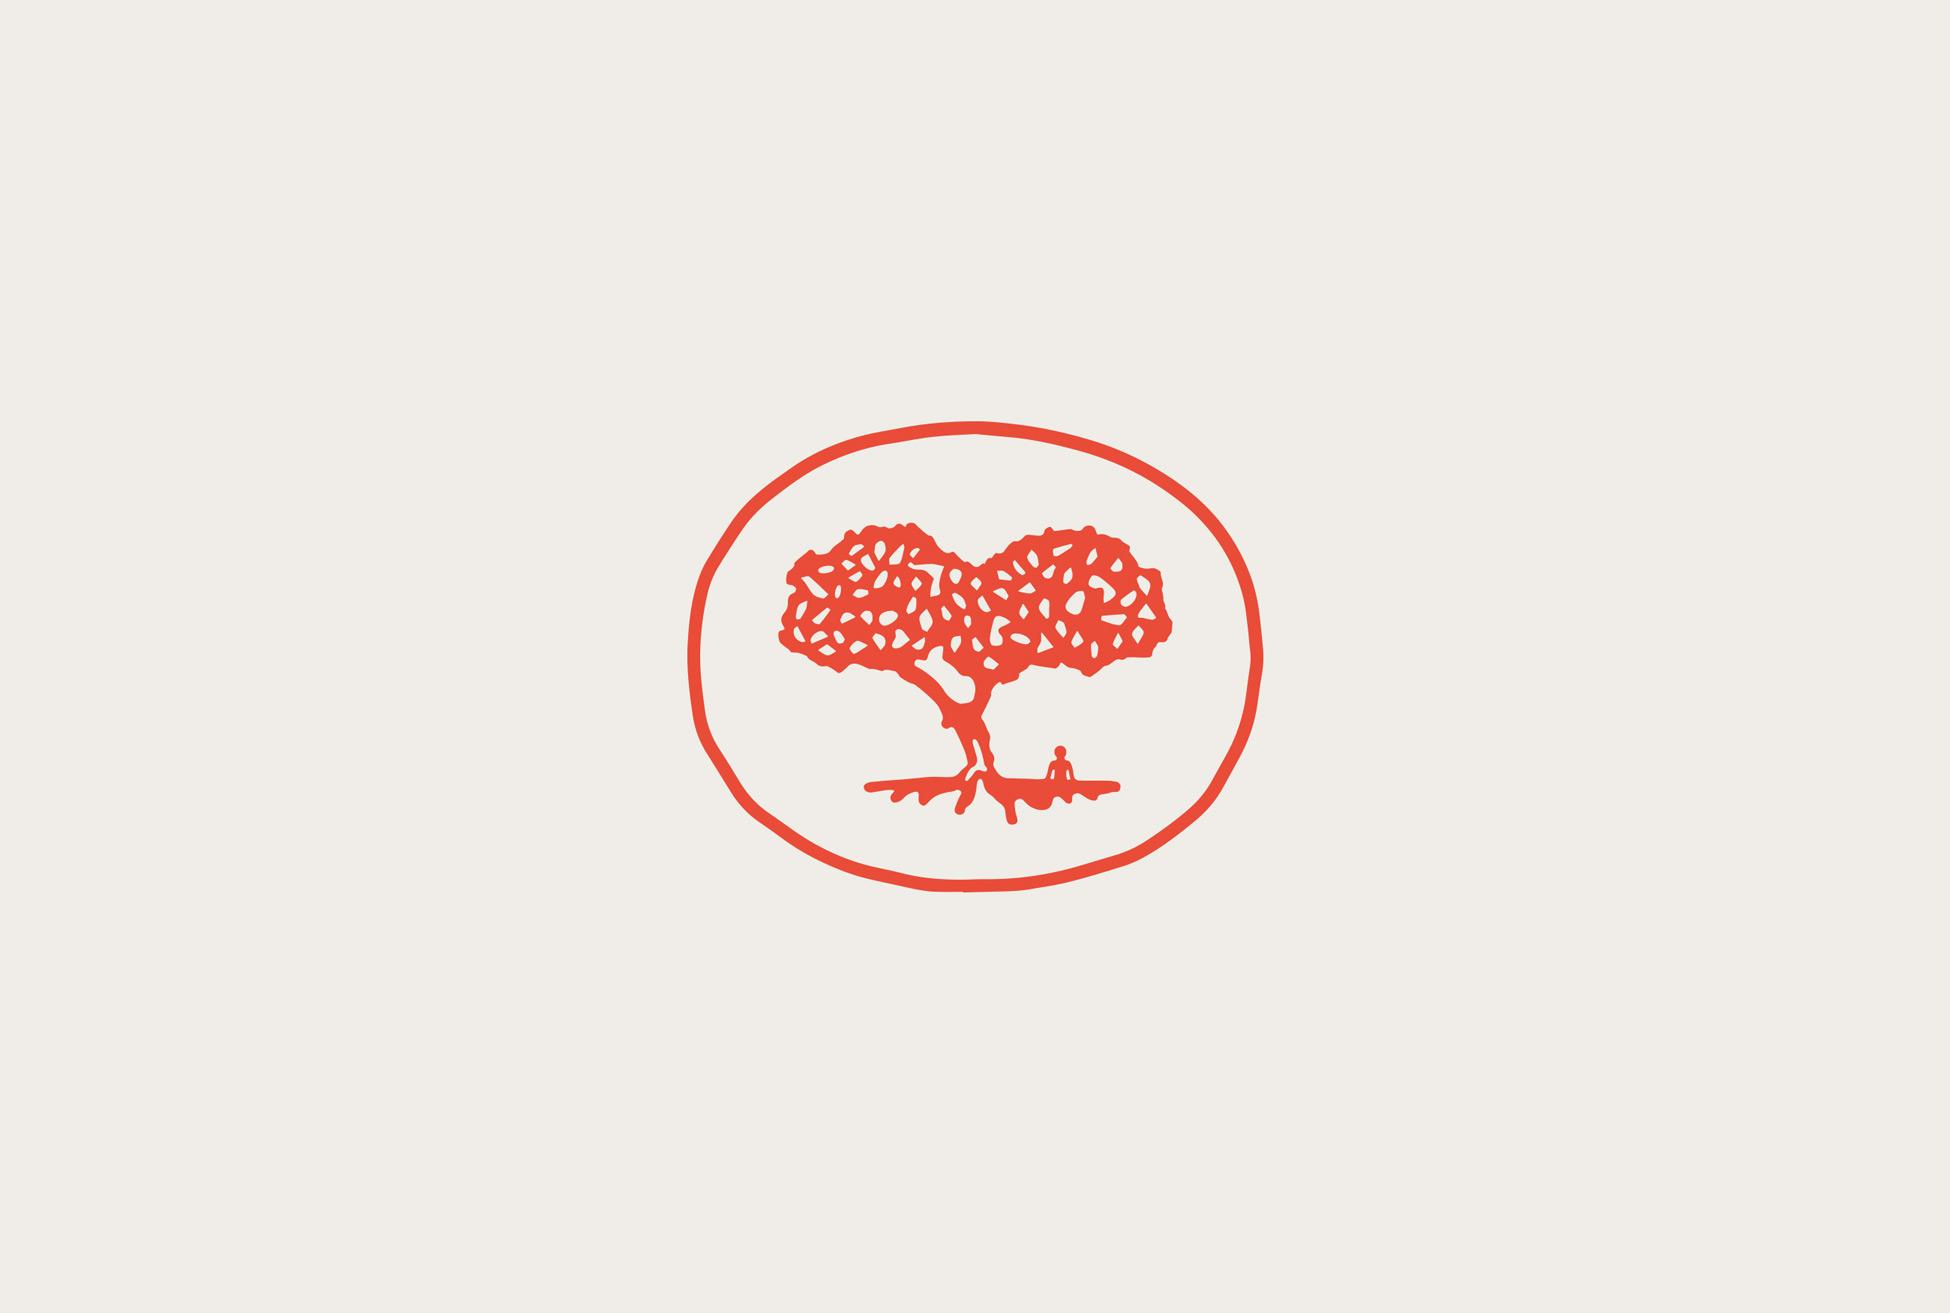 orphanshade_tree-mark.jpg